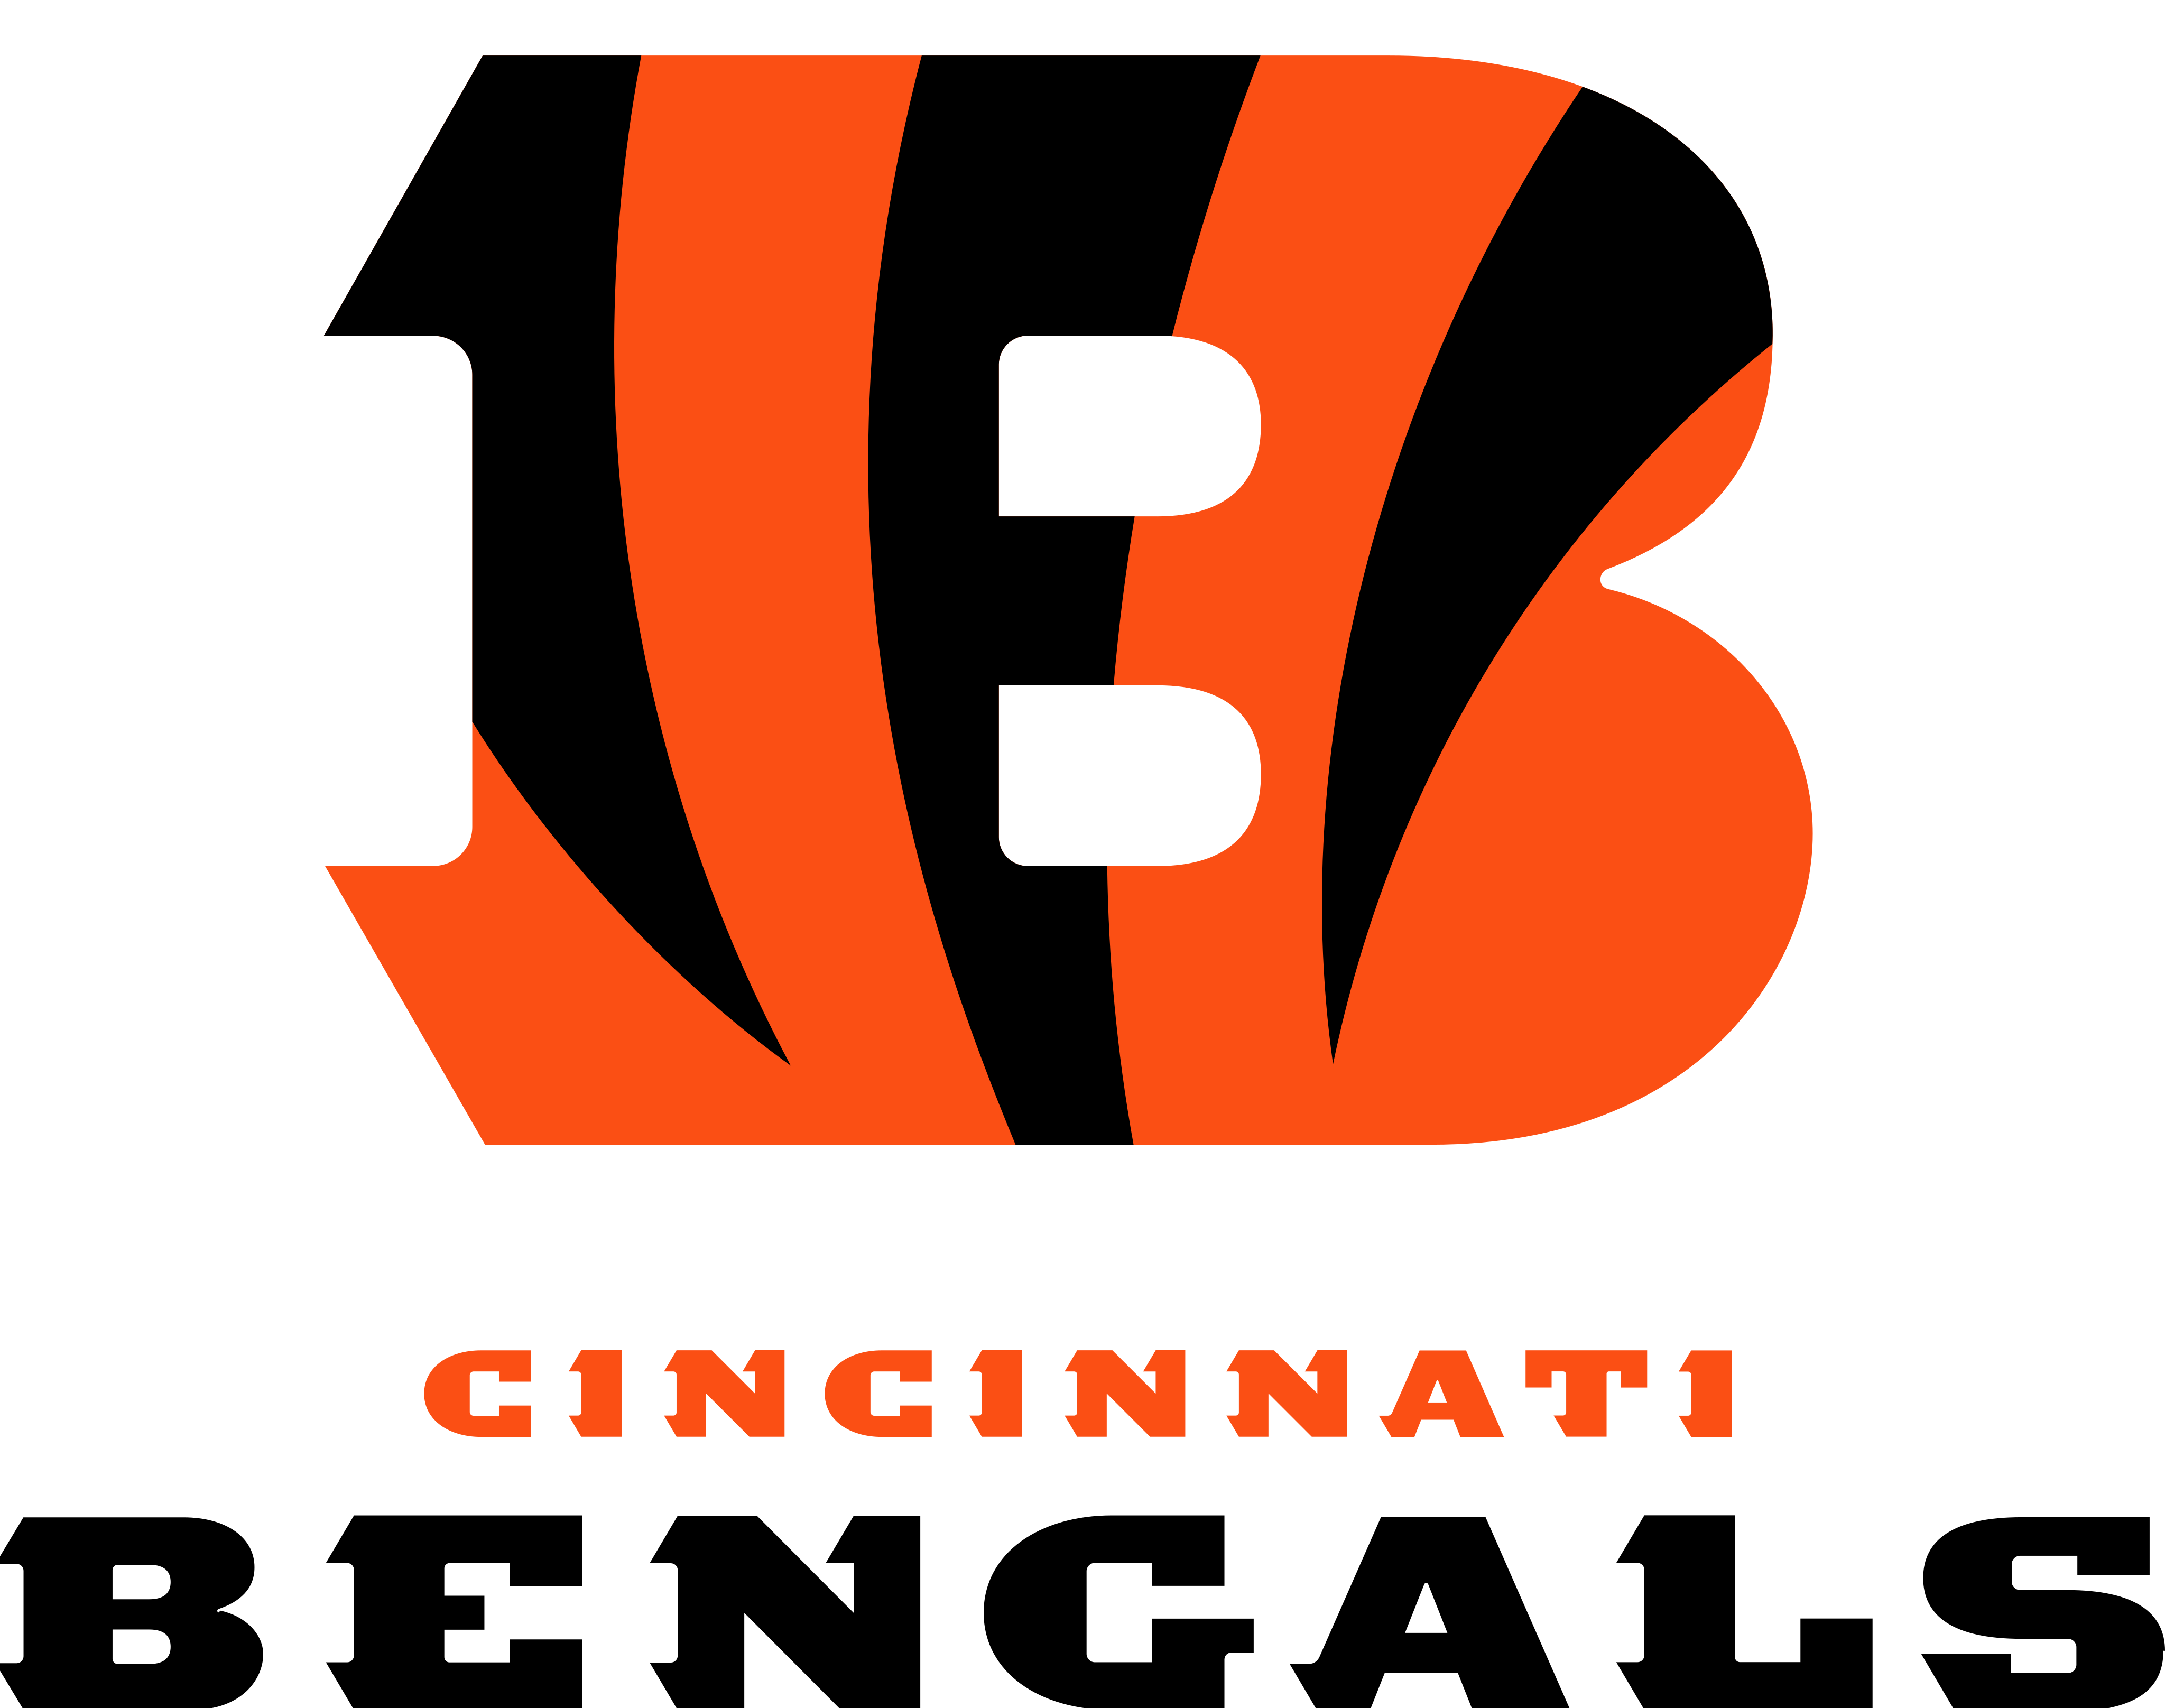 Cincinnati Bengals Logo.